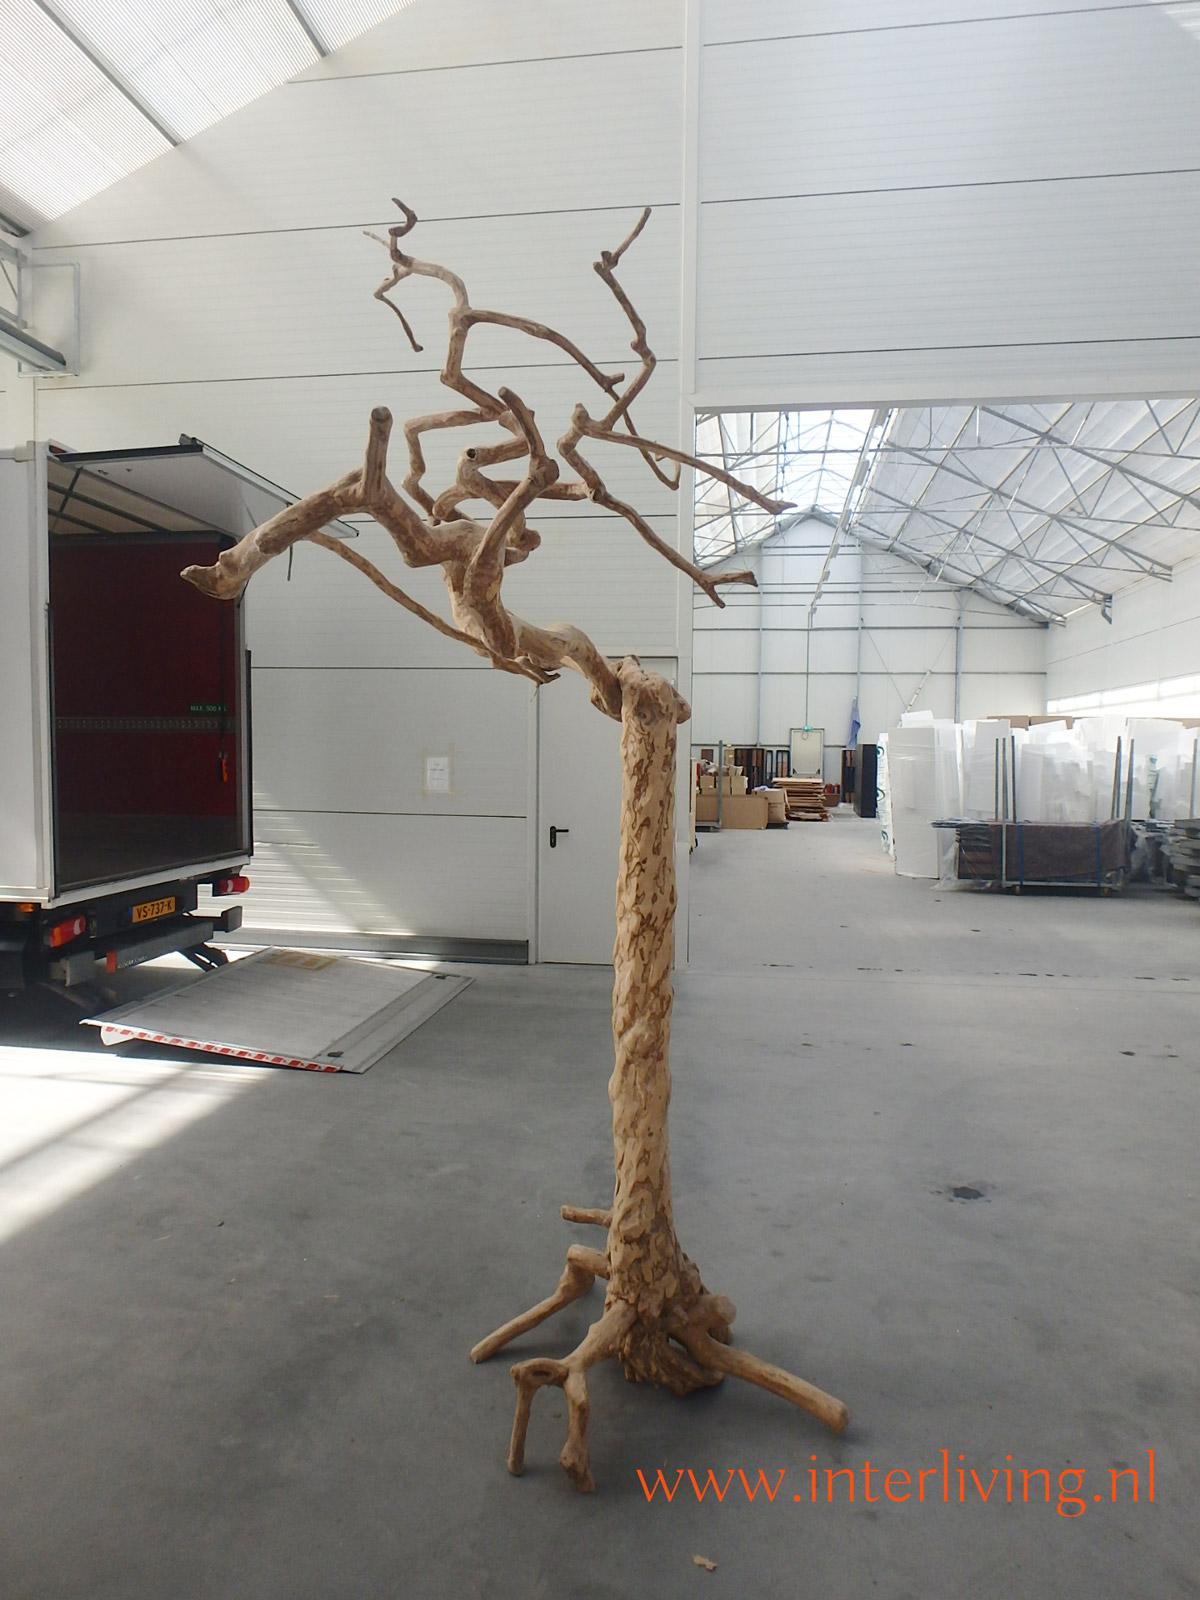 koffieboom met kronkel takken - java tree - speelboom voor papegaaien